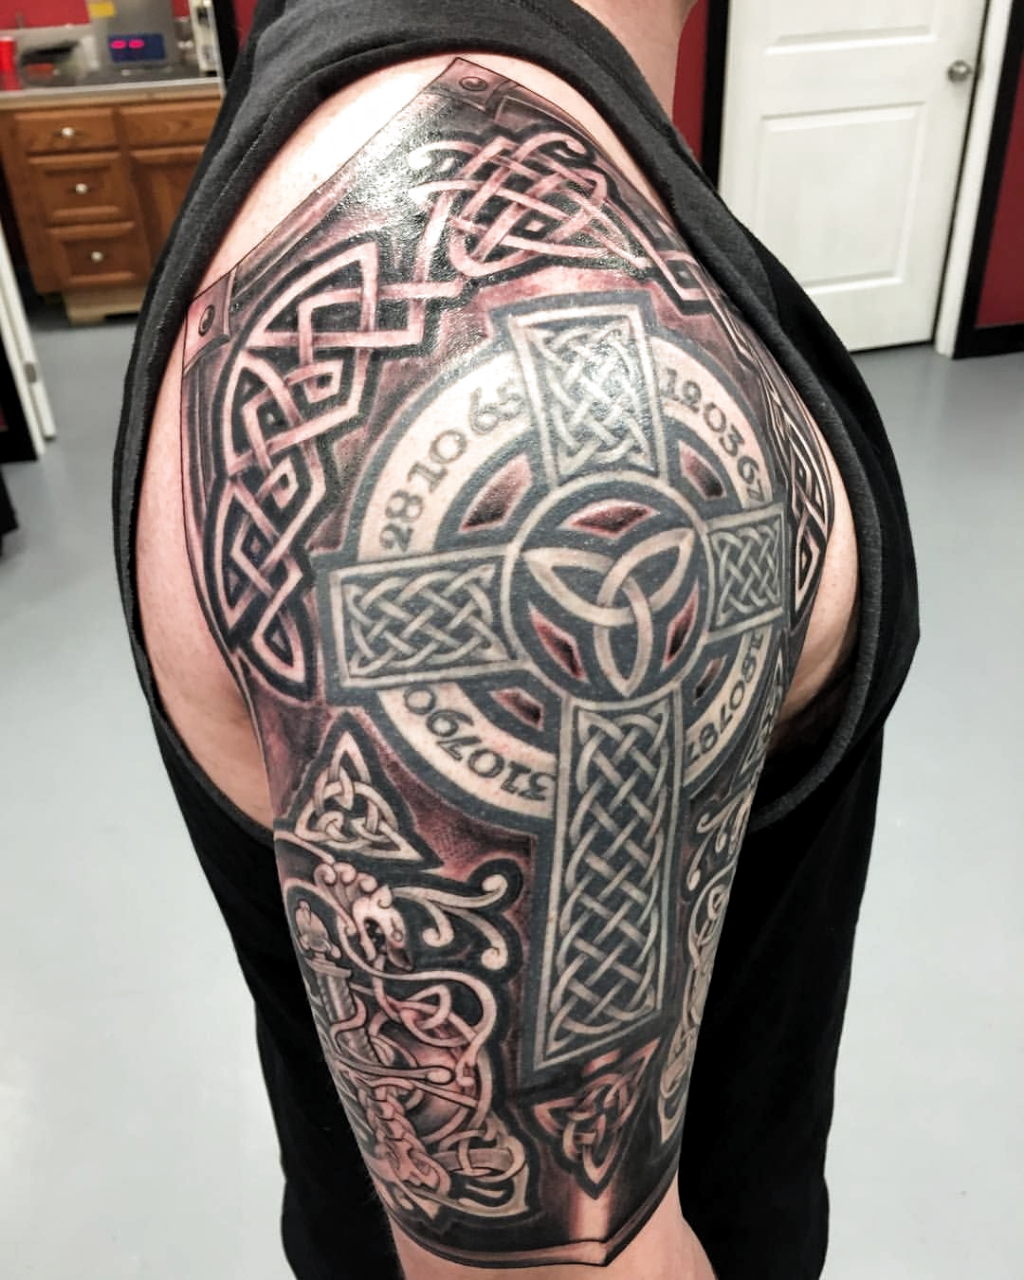 Fresh ink what do ya think!! #tattoos #tattoo #tattoosleeve #tattoosleeves #celtictattoo #celticcrosstattoo